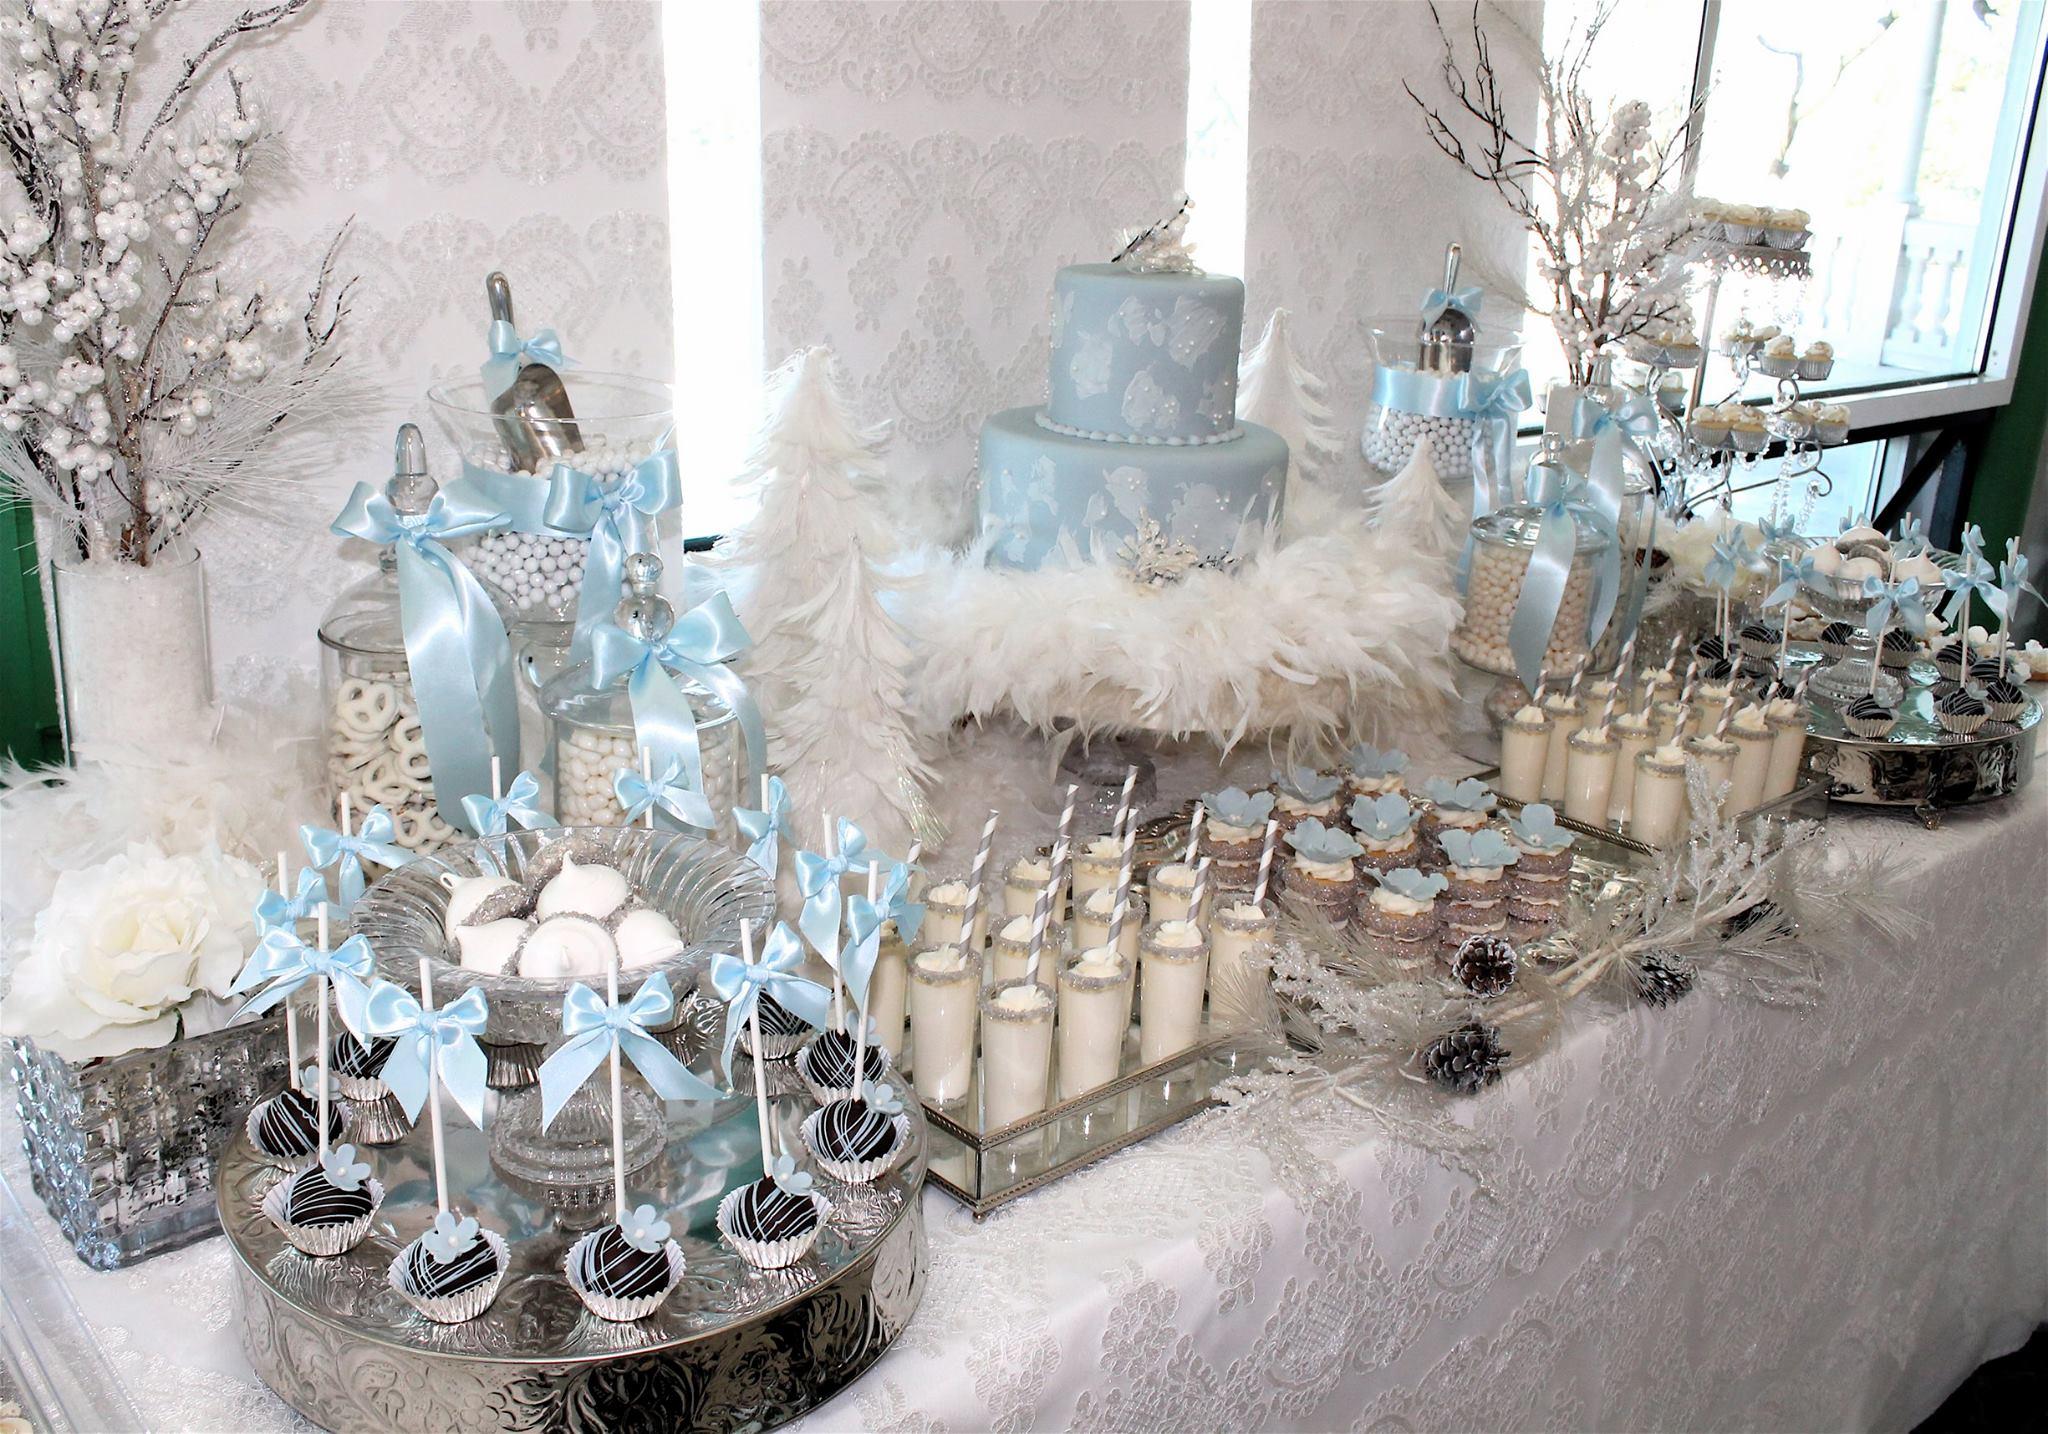 Icy Winter Wedding